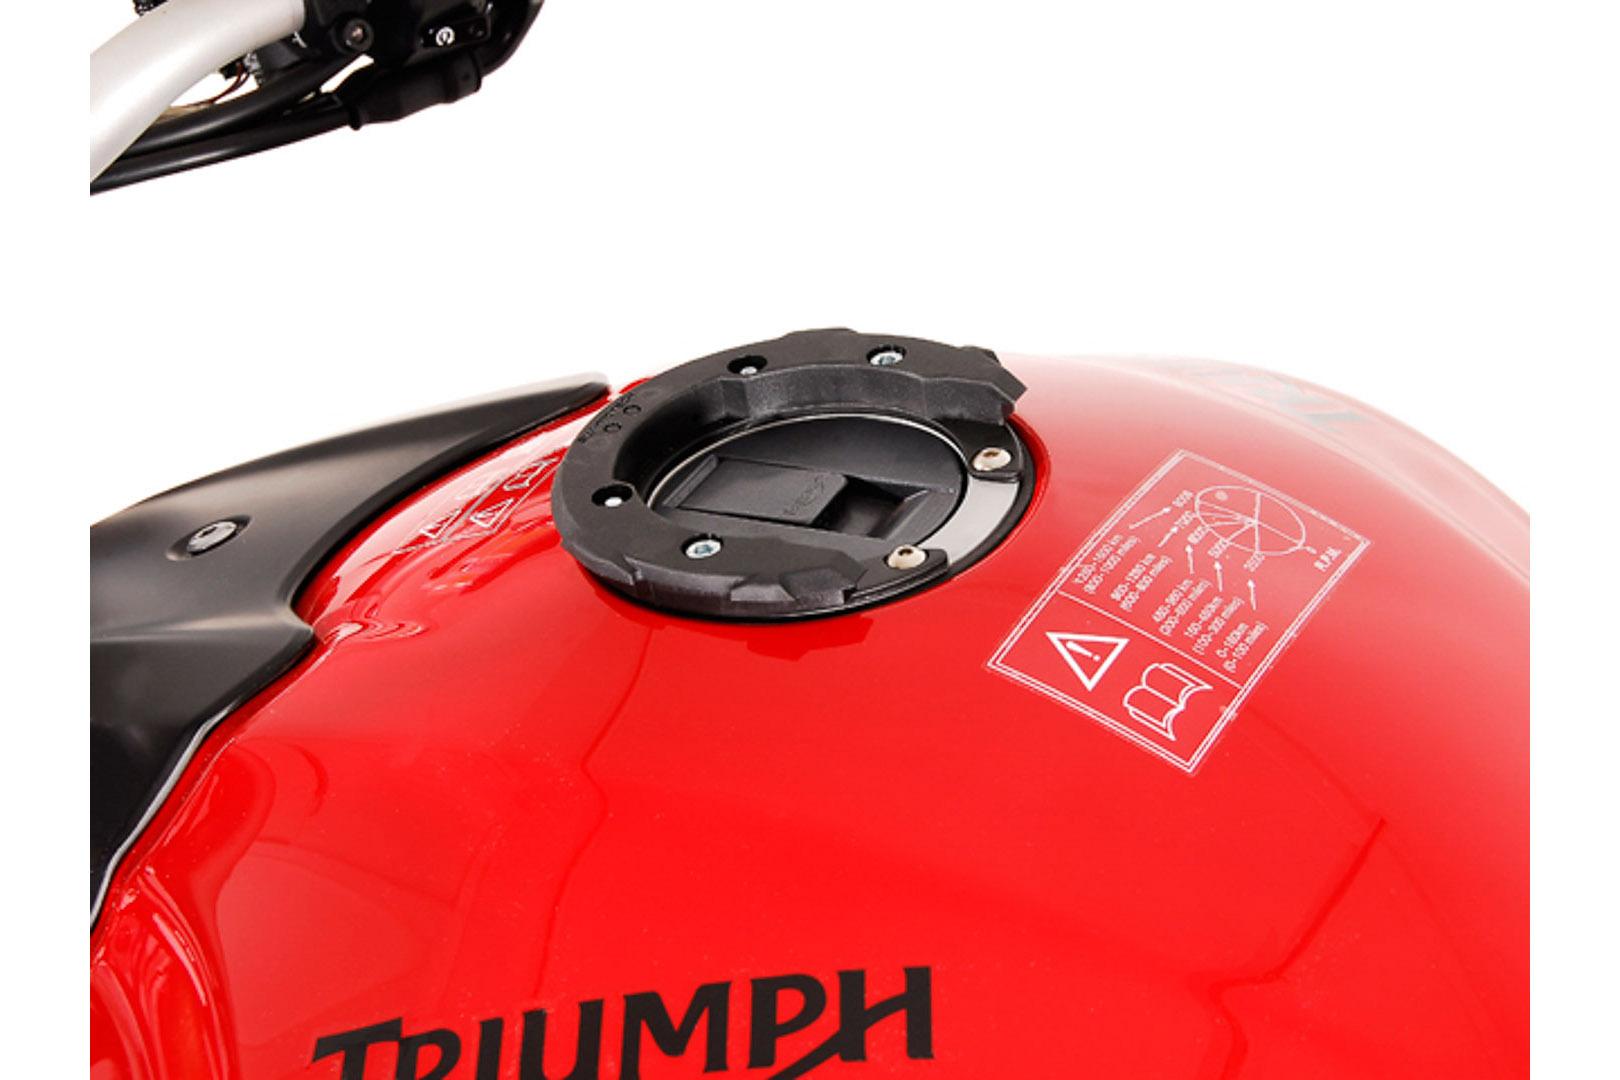 Quick-Lock EVO tankkilaukun kiinnike, Triumph 6 ruuvia